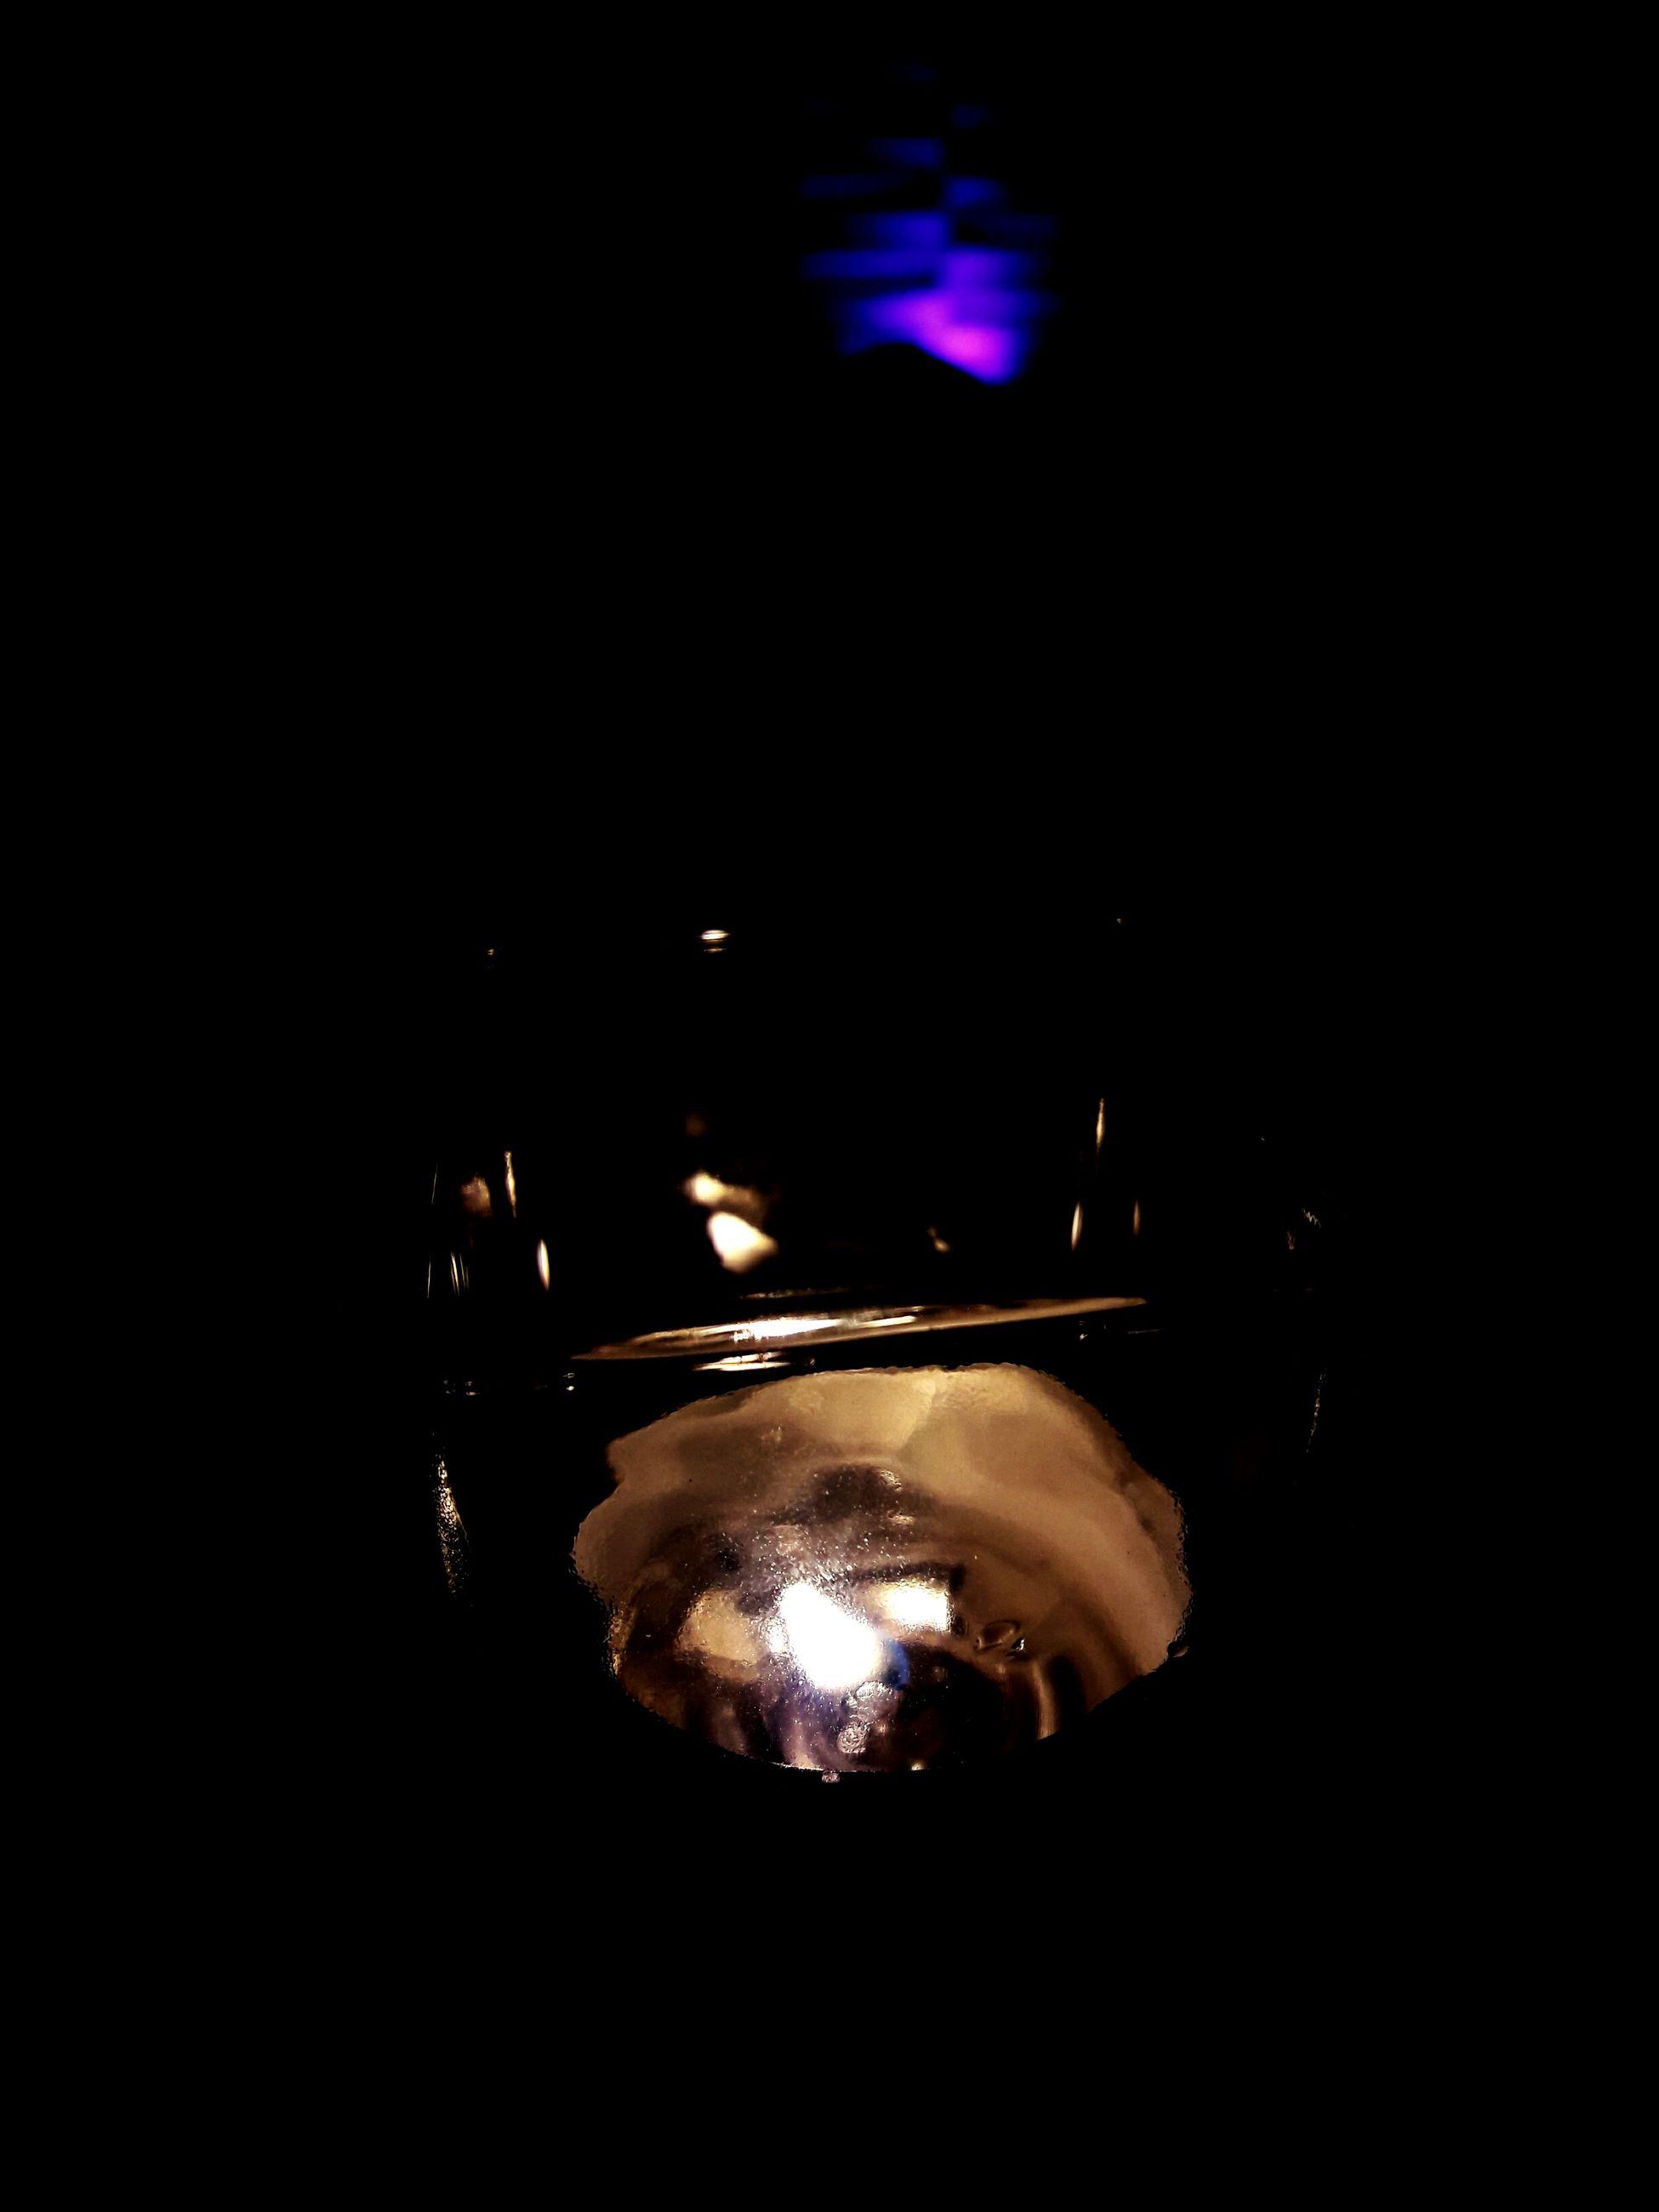 illuminated, night, glowing, no people, burning, close-up, cultures, flame, nature, outdoors, diya - oil lamp